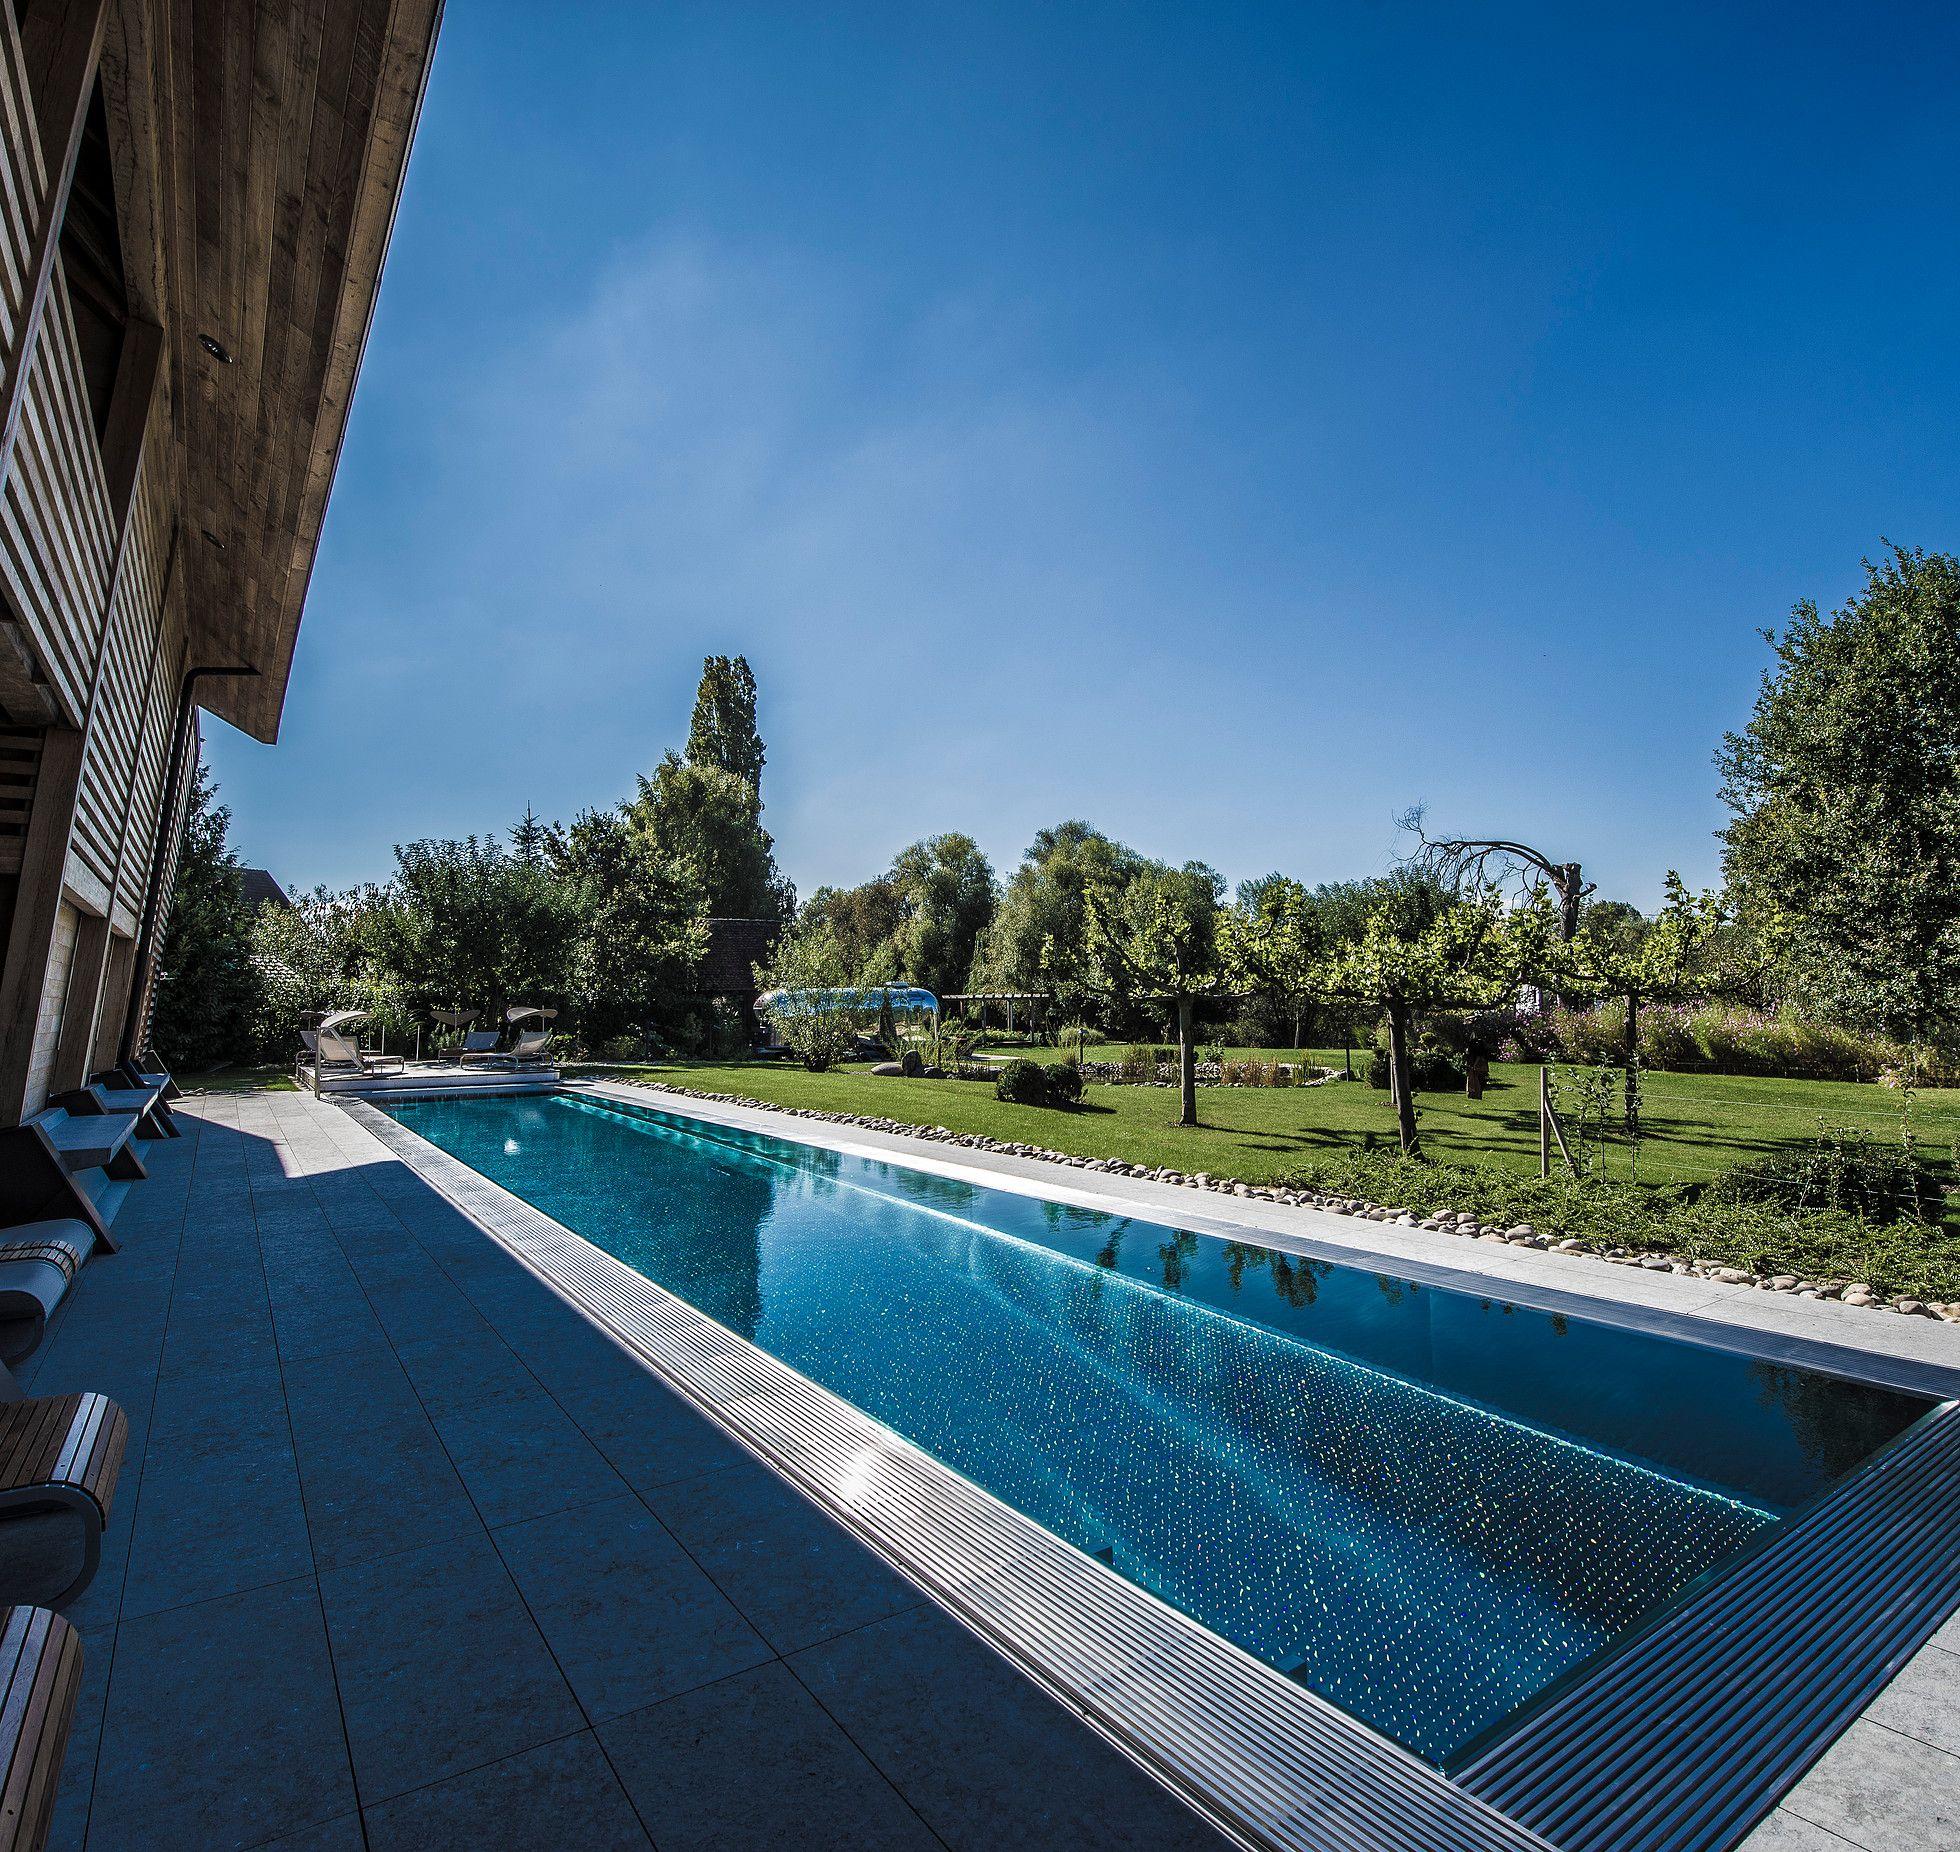 Piscine En Bois Alsace fabricant de piscine et spa d'exception en inox. nos